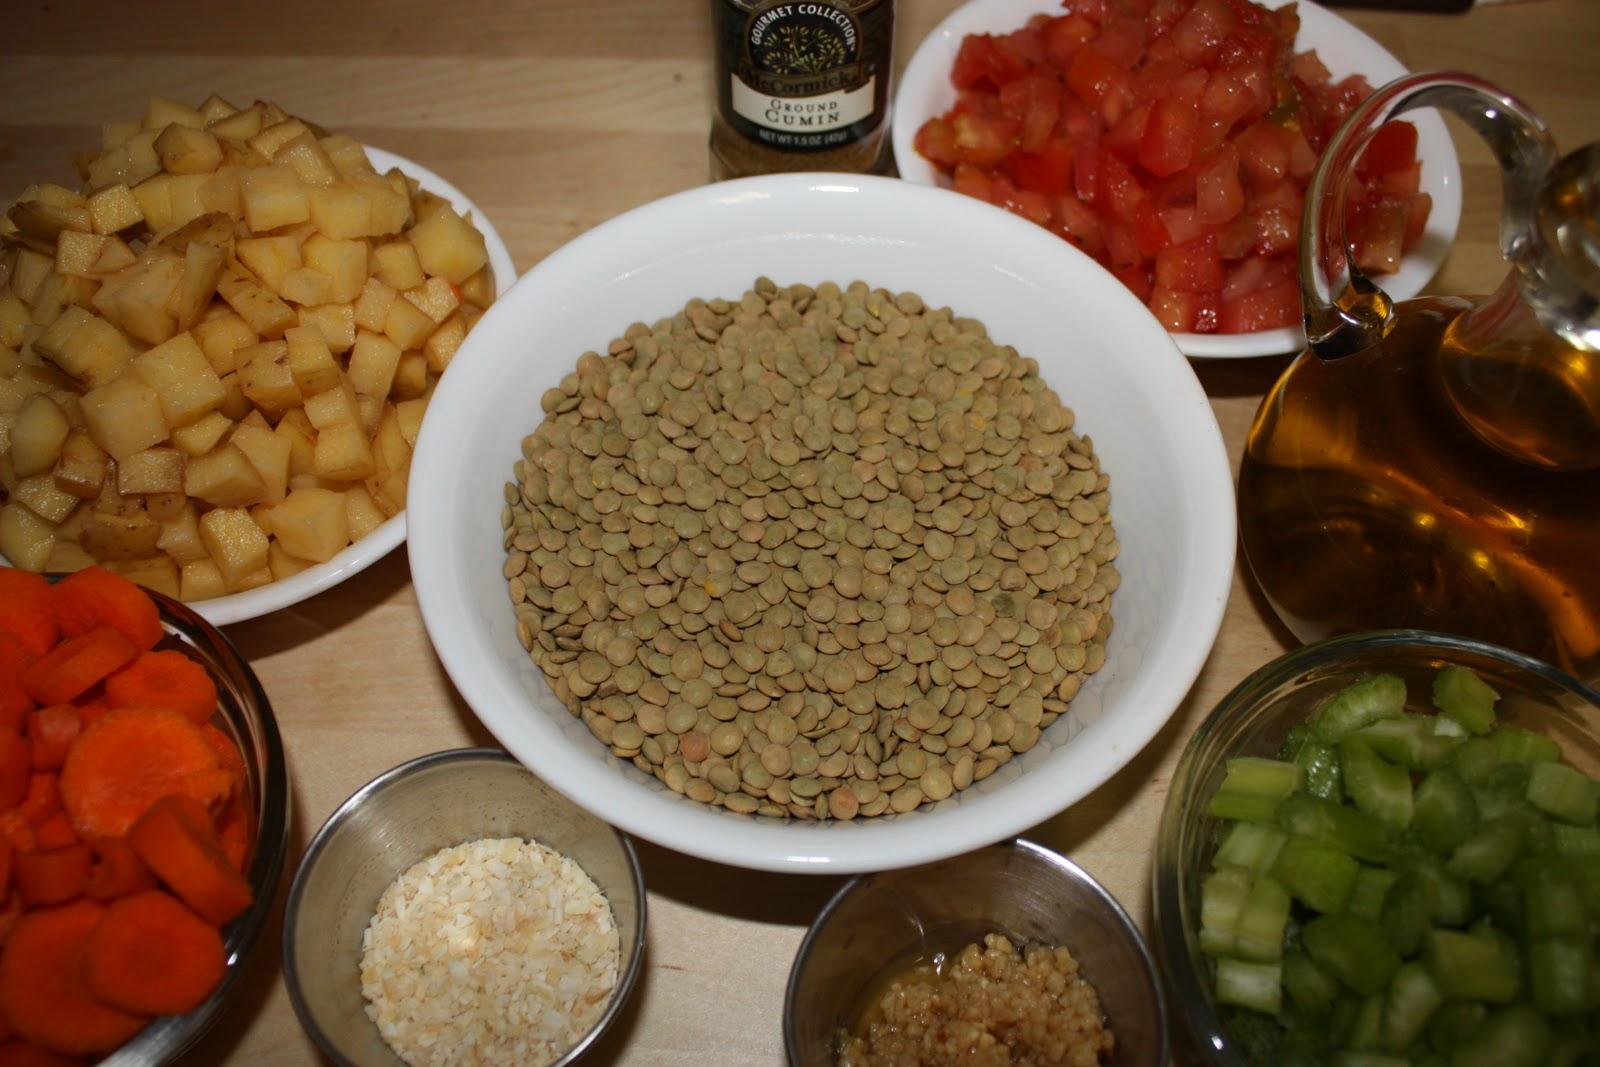 High Potassium Foods Handout